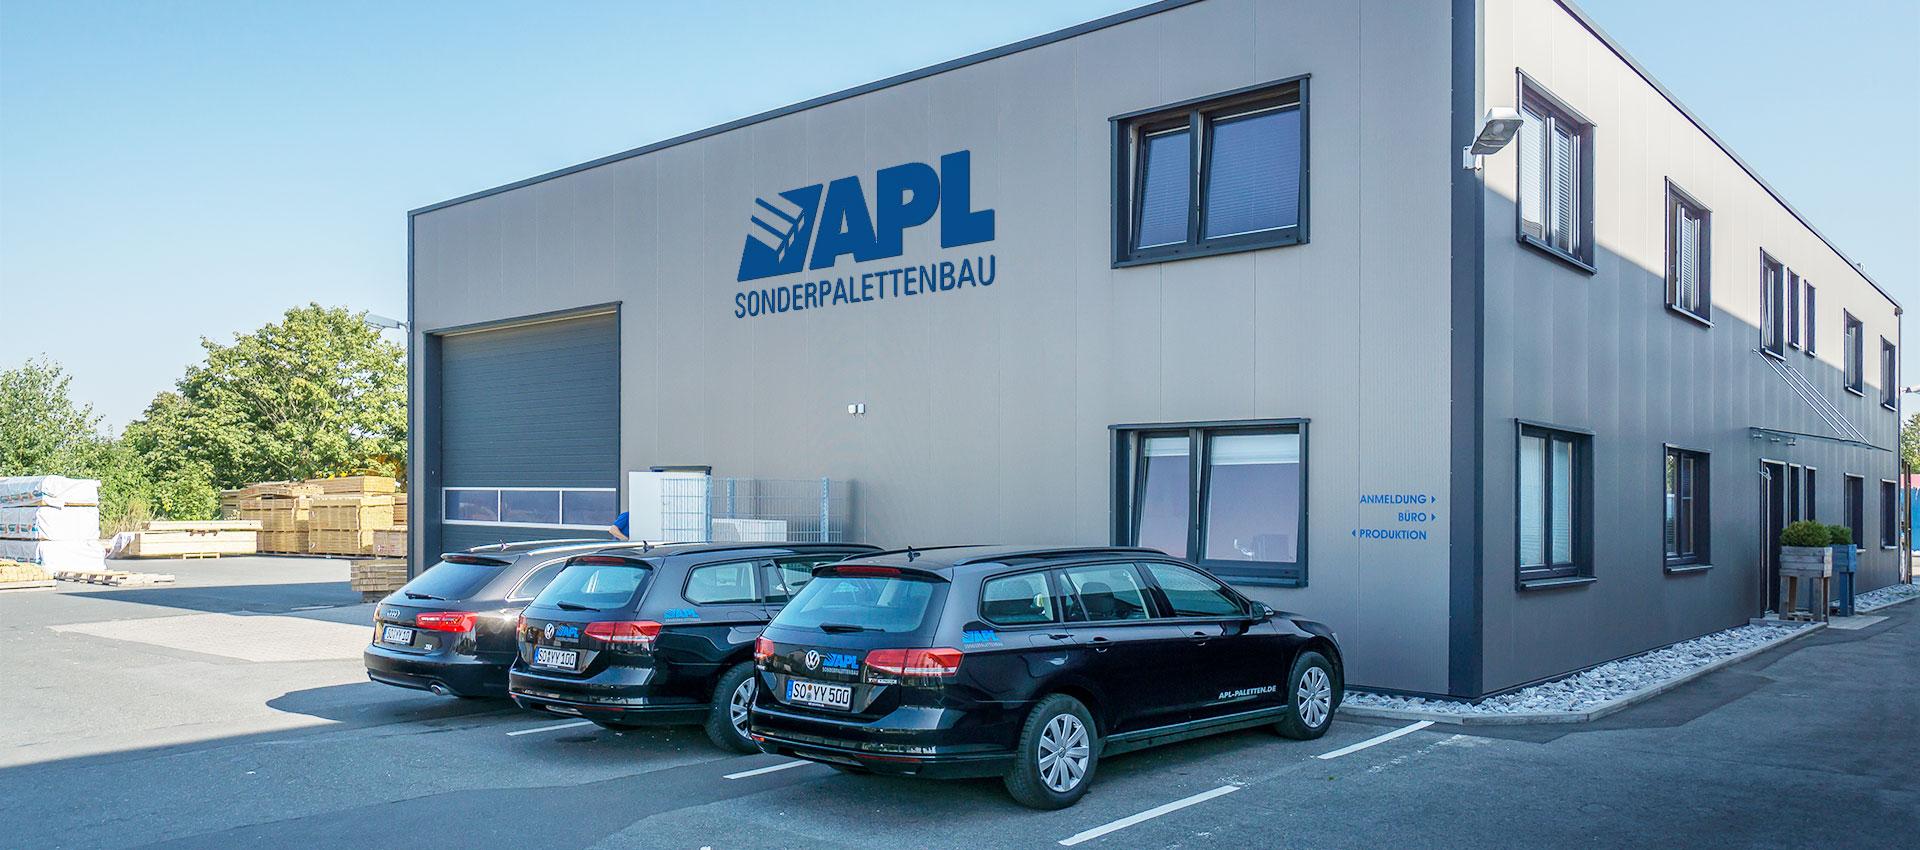 APL Sonderpalettenbau